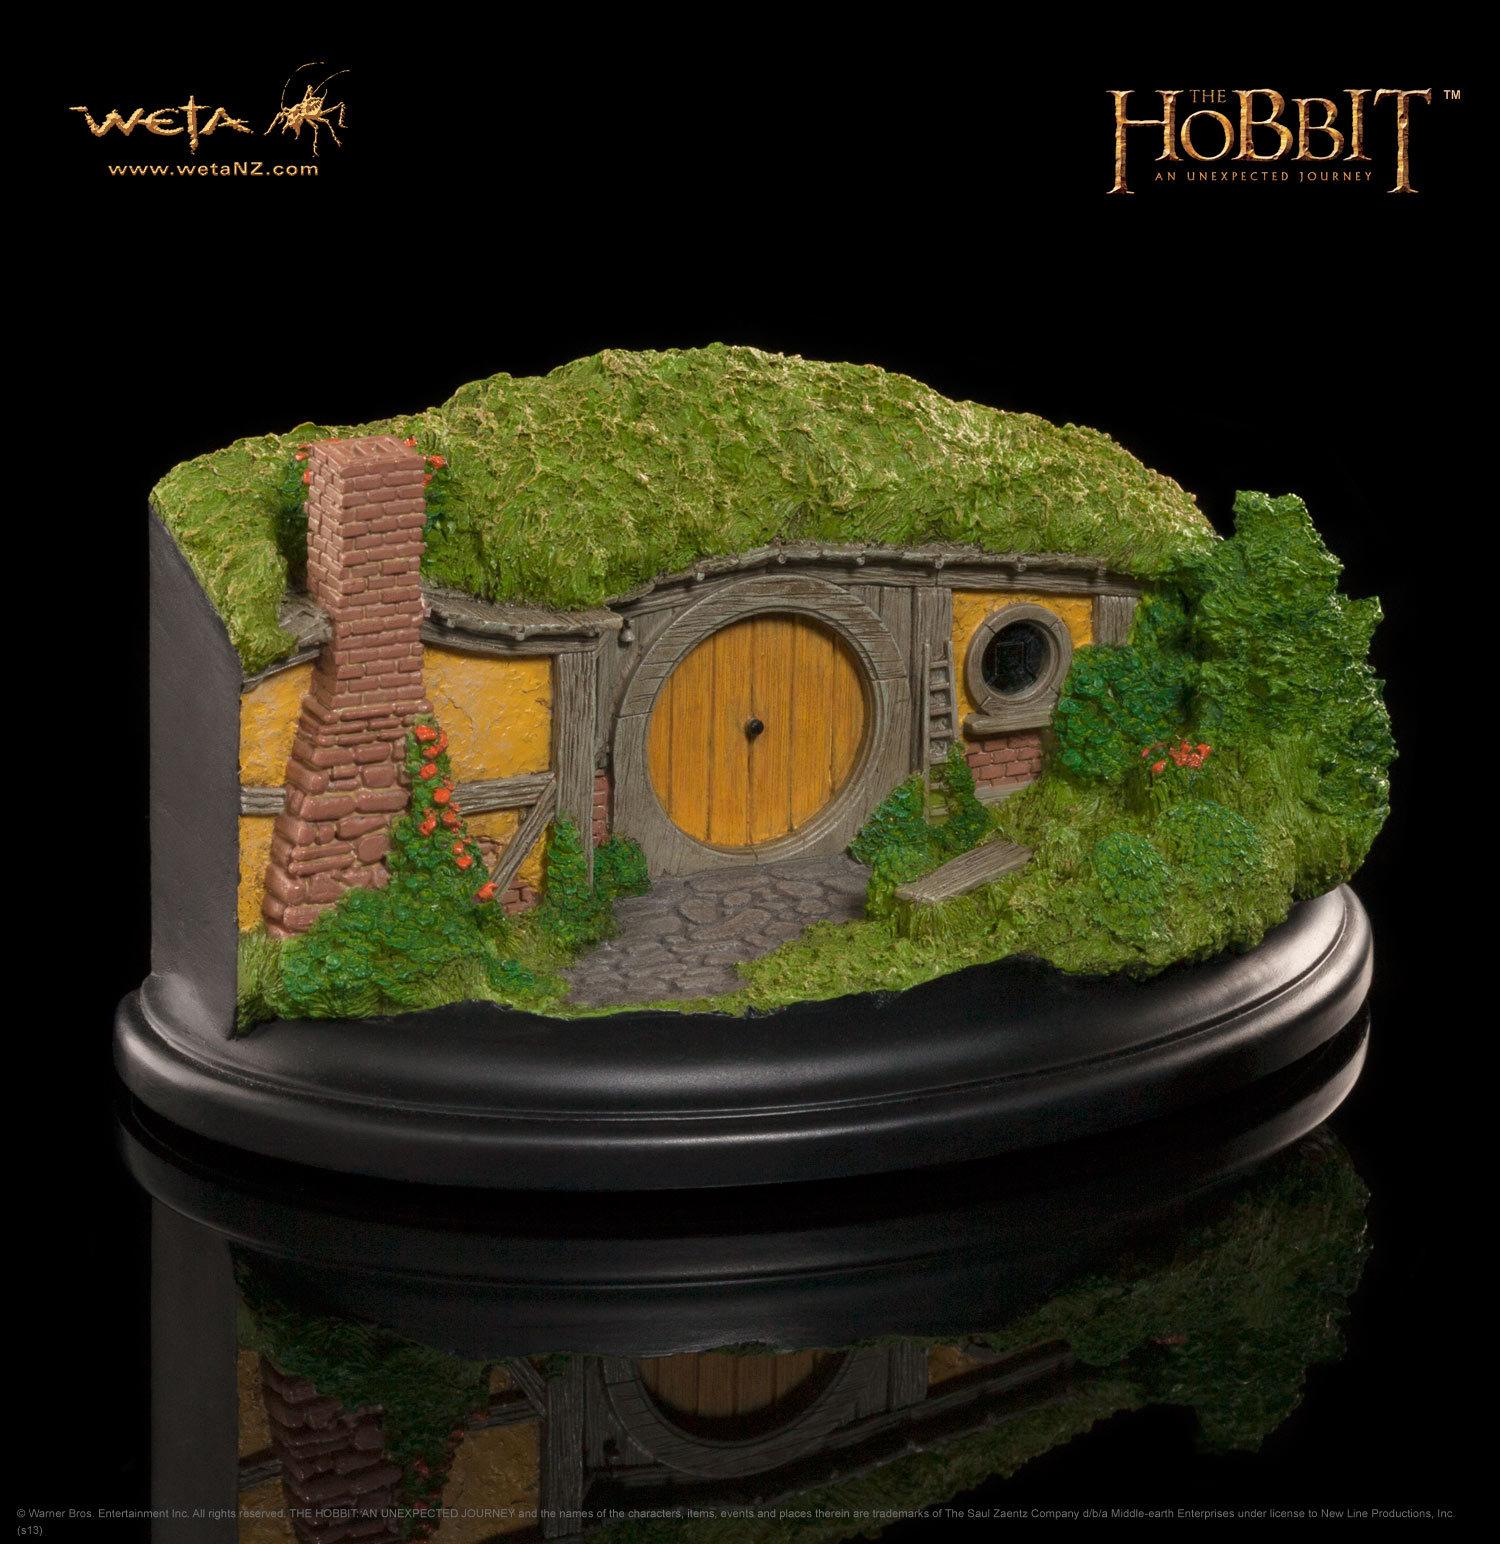 The Hobbit 1 Bagshot Row Hobbit Hole Statue - by Weta image